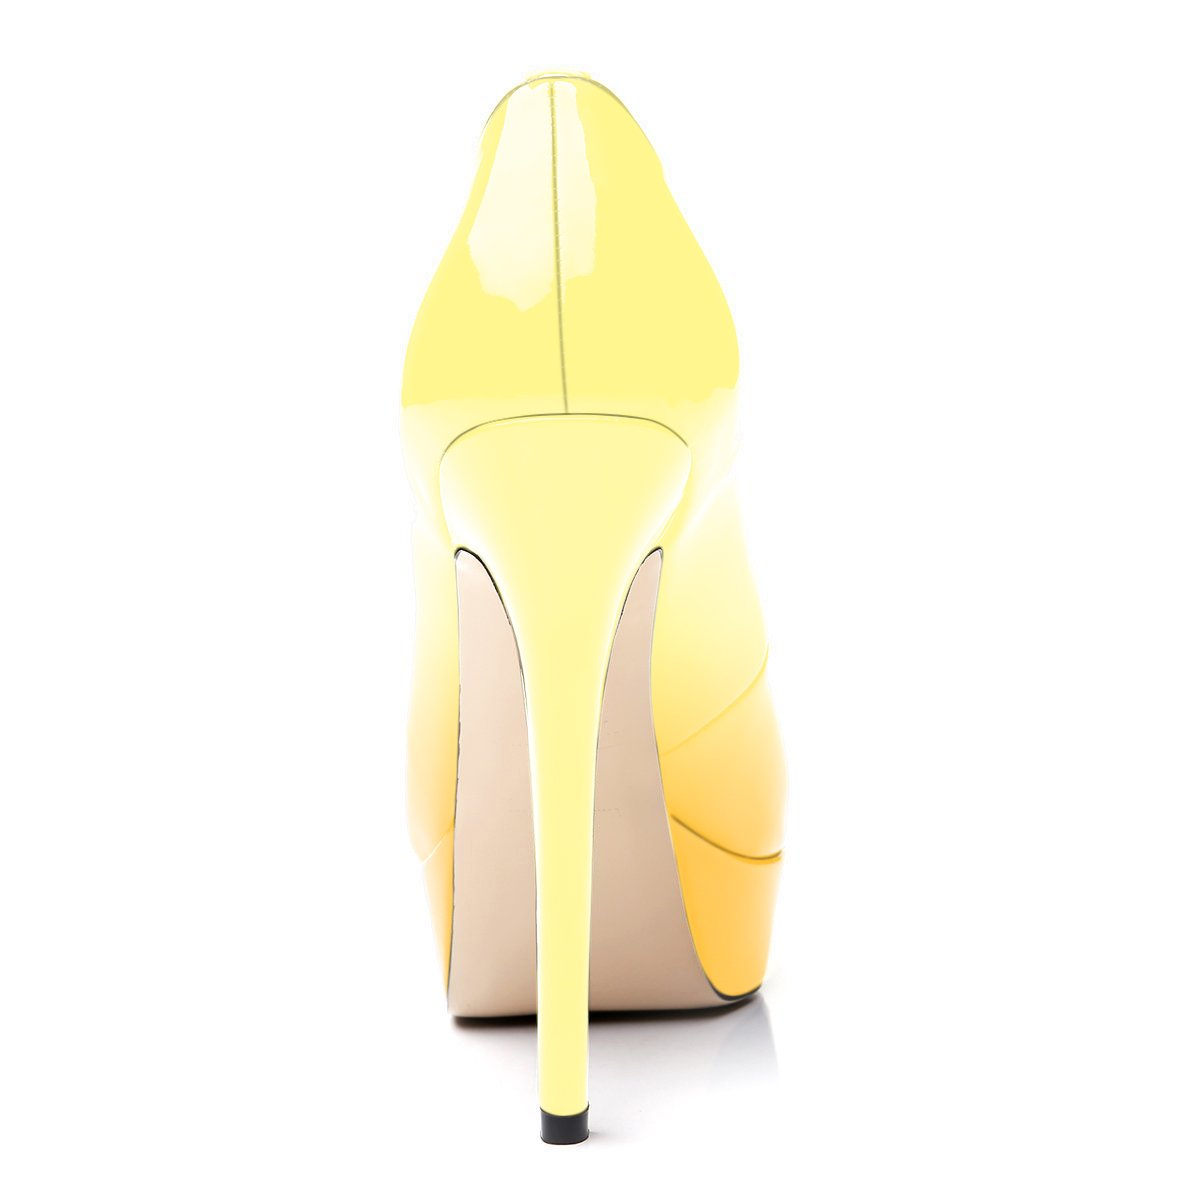 UBeauty Stilettos Damen Pumps Stilettos UBeauty High Heels Peep Toe Glitzer Übergröße Sandalens mit Plateau Gelb Farbverlauf a6e872